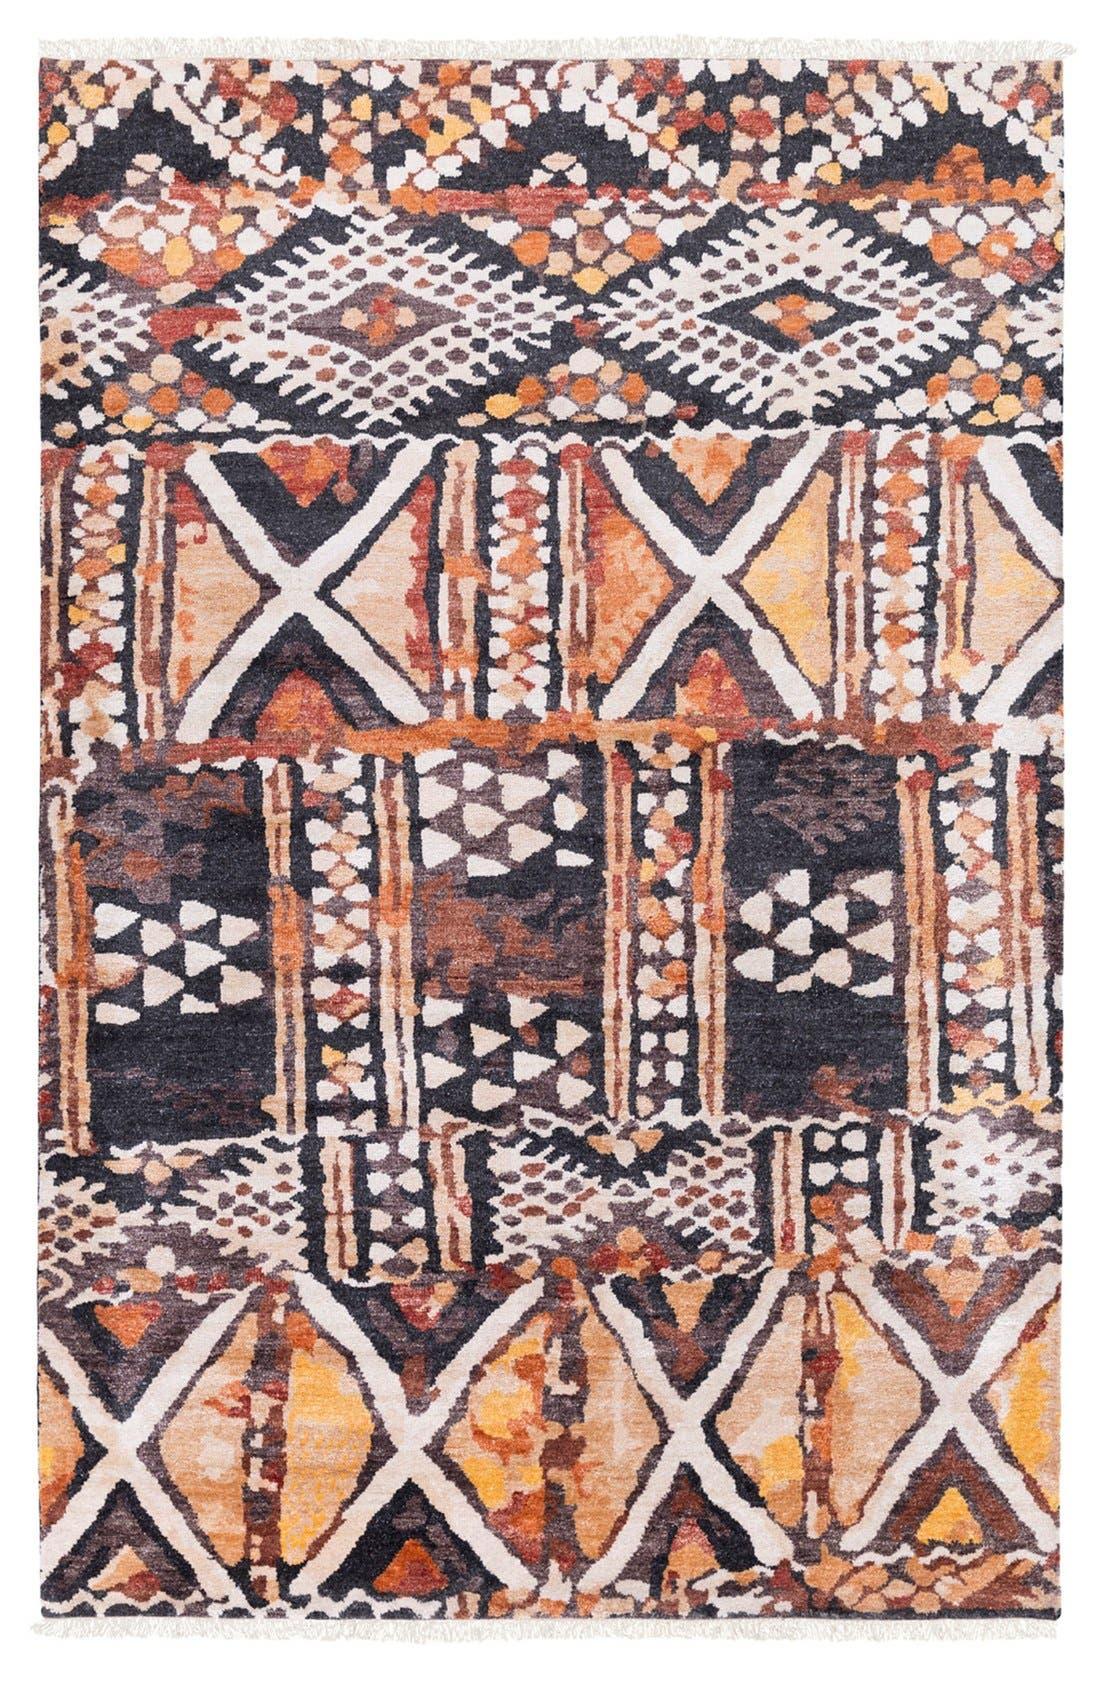 'Zambia' Rug,                         Main,                         color, 001